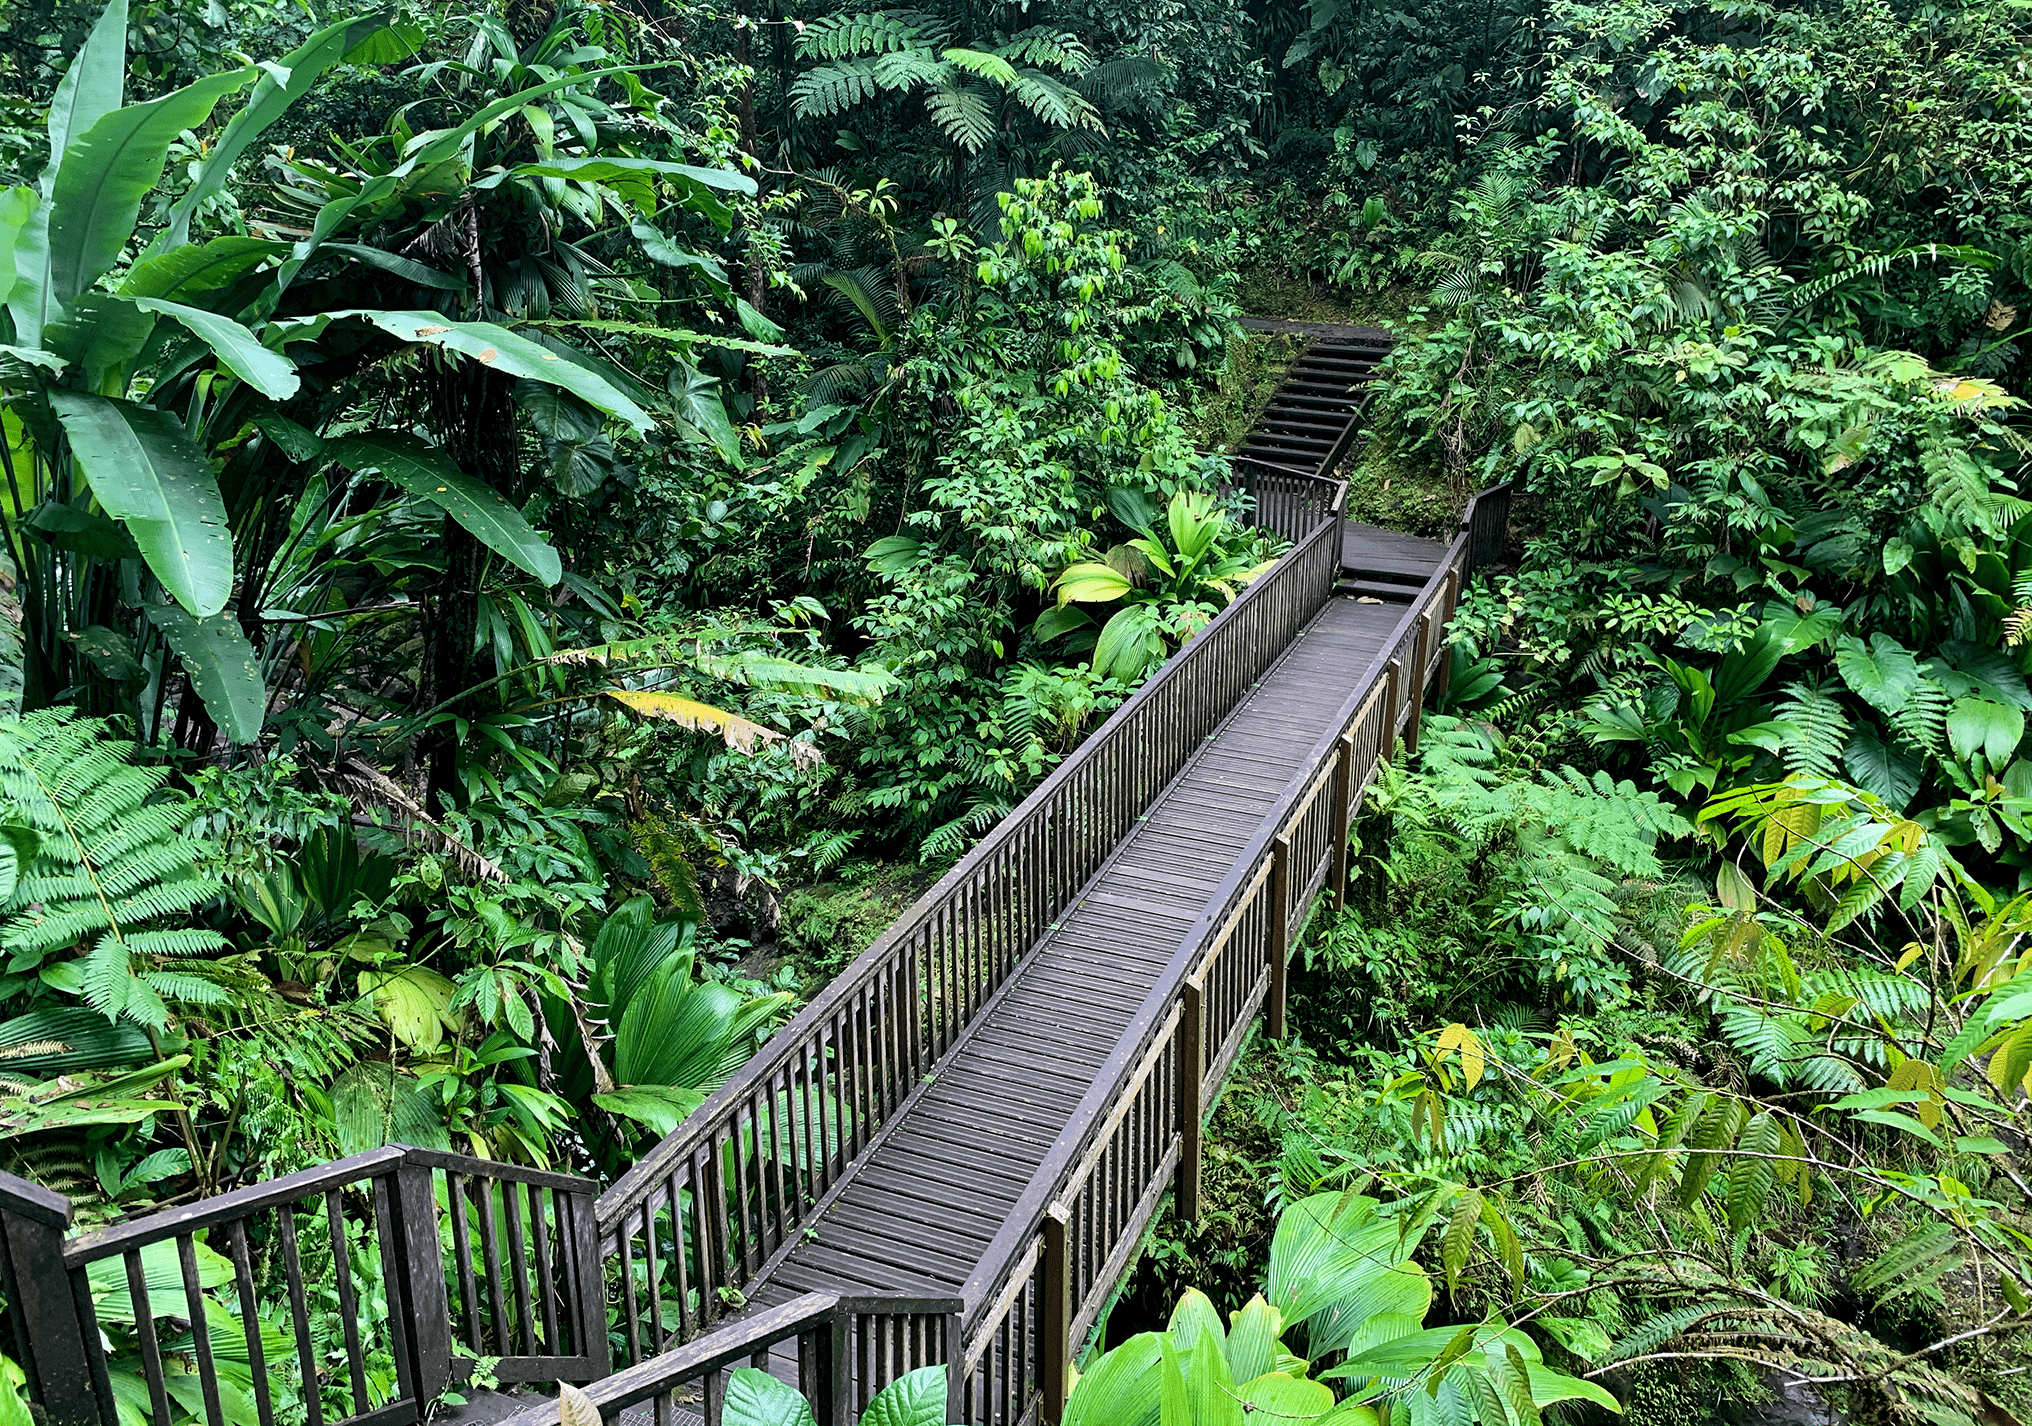 escaliers-cascade-chute-du-carbet-basse-terre-guadeloupe